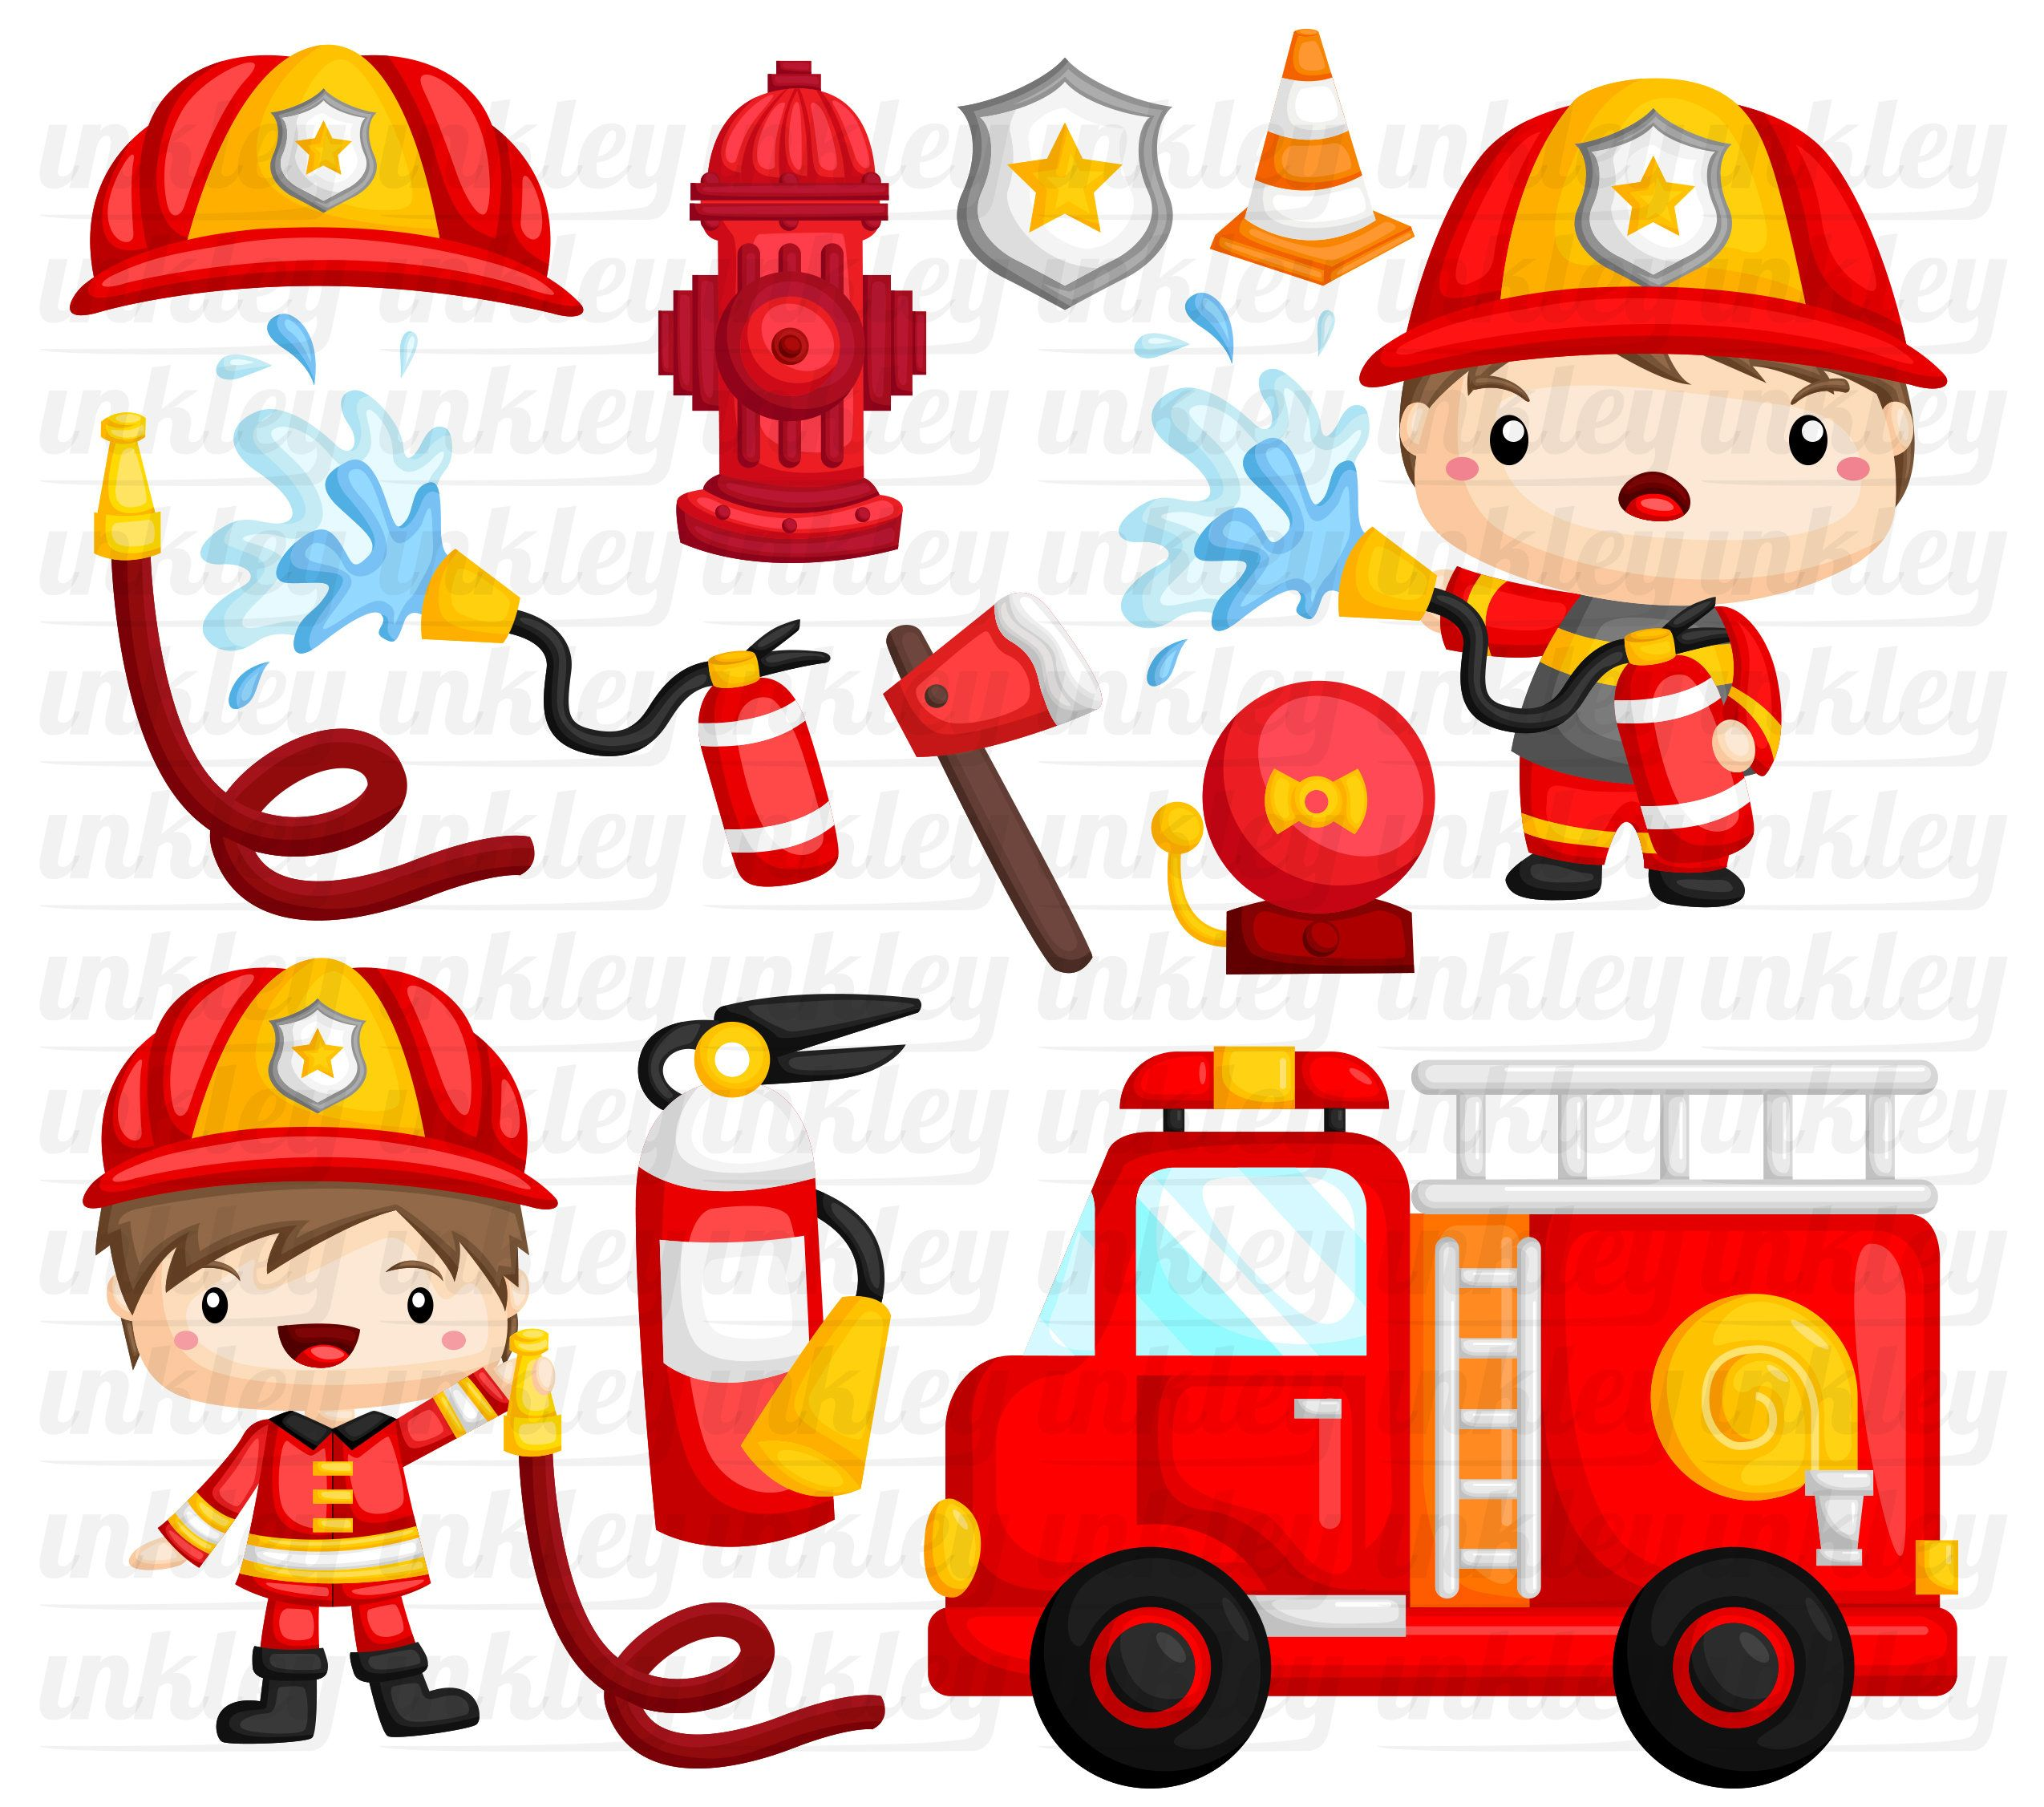 Cute Fireman Clipart Job And Occupation Clip Art Profession Free Svg On Request Clip Art Firefighter Clipart Fireman